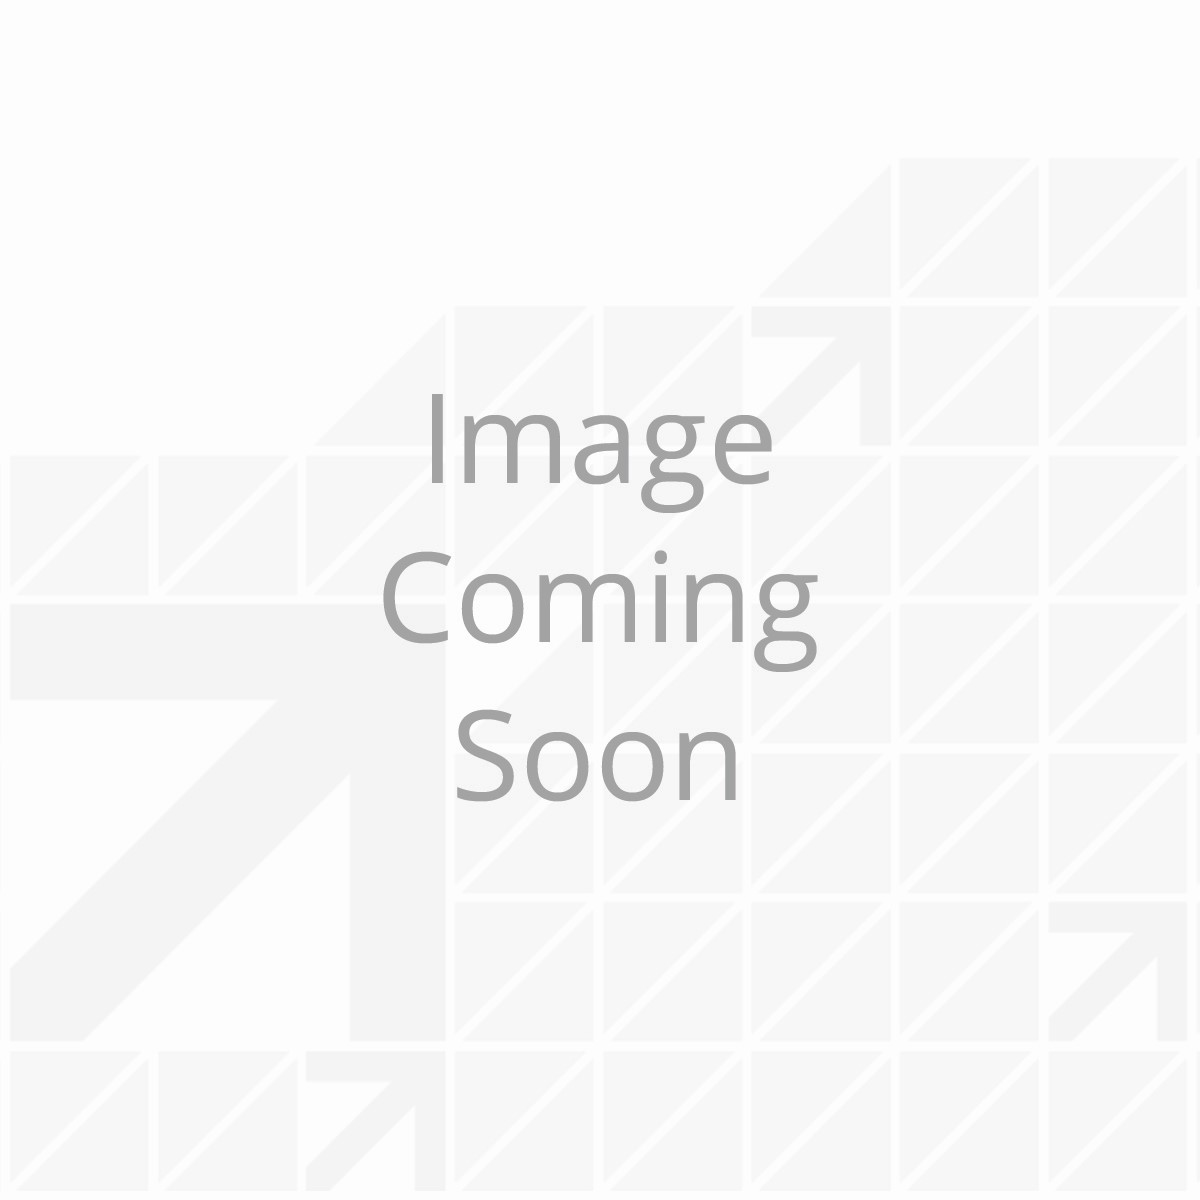 "Solera® Manual Hardware for Short Awnings (61-1/2"" Arms) Black"